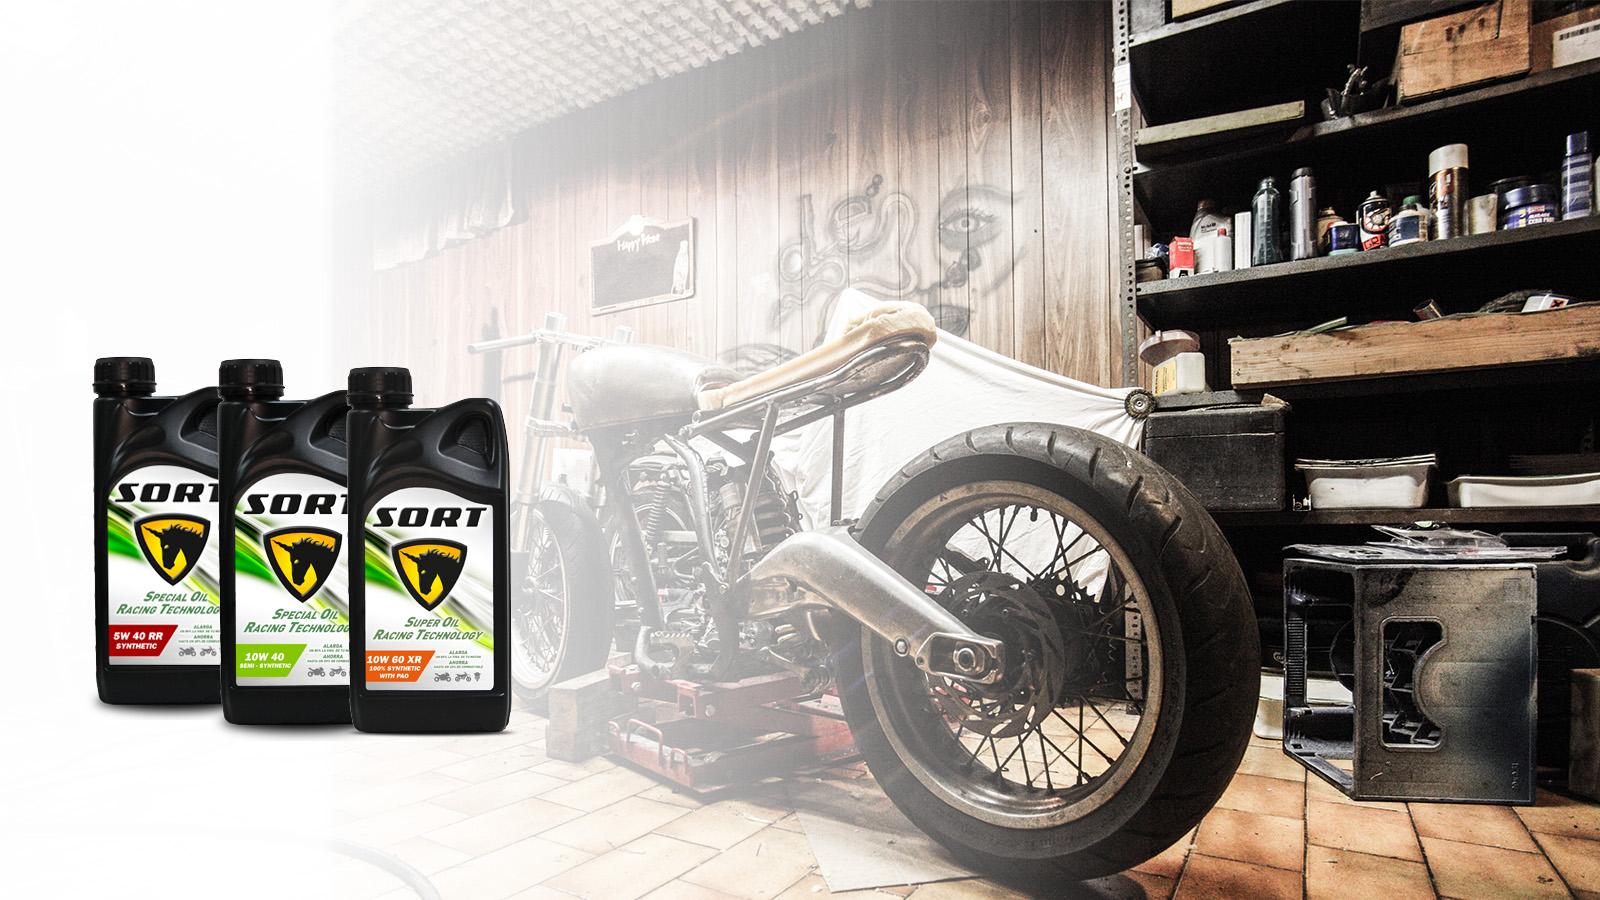 For motorcycle craftsmen